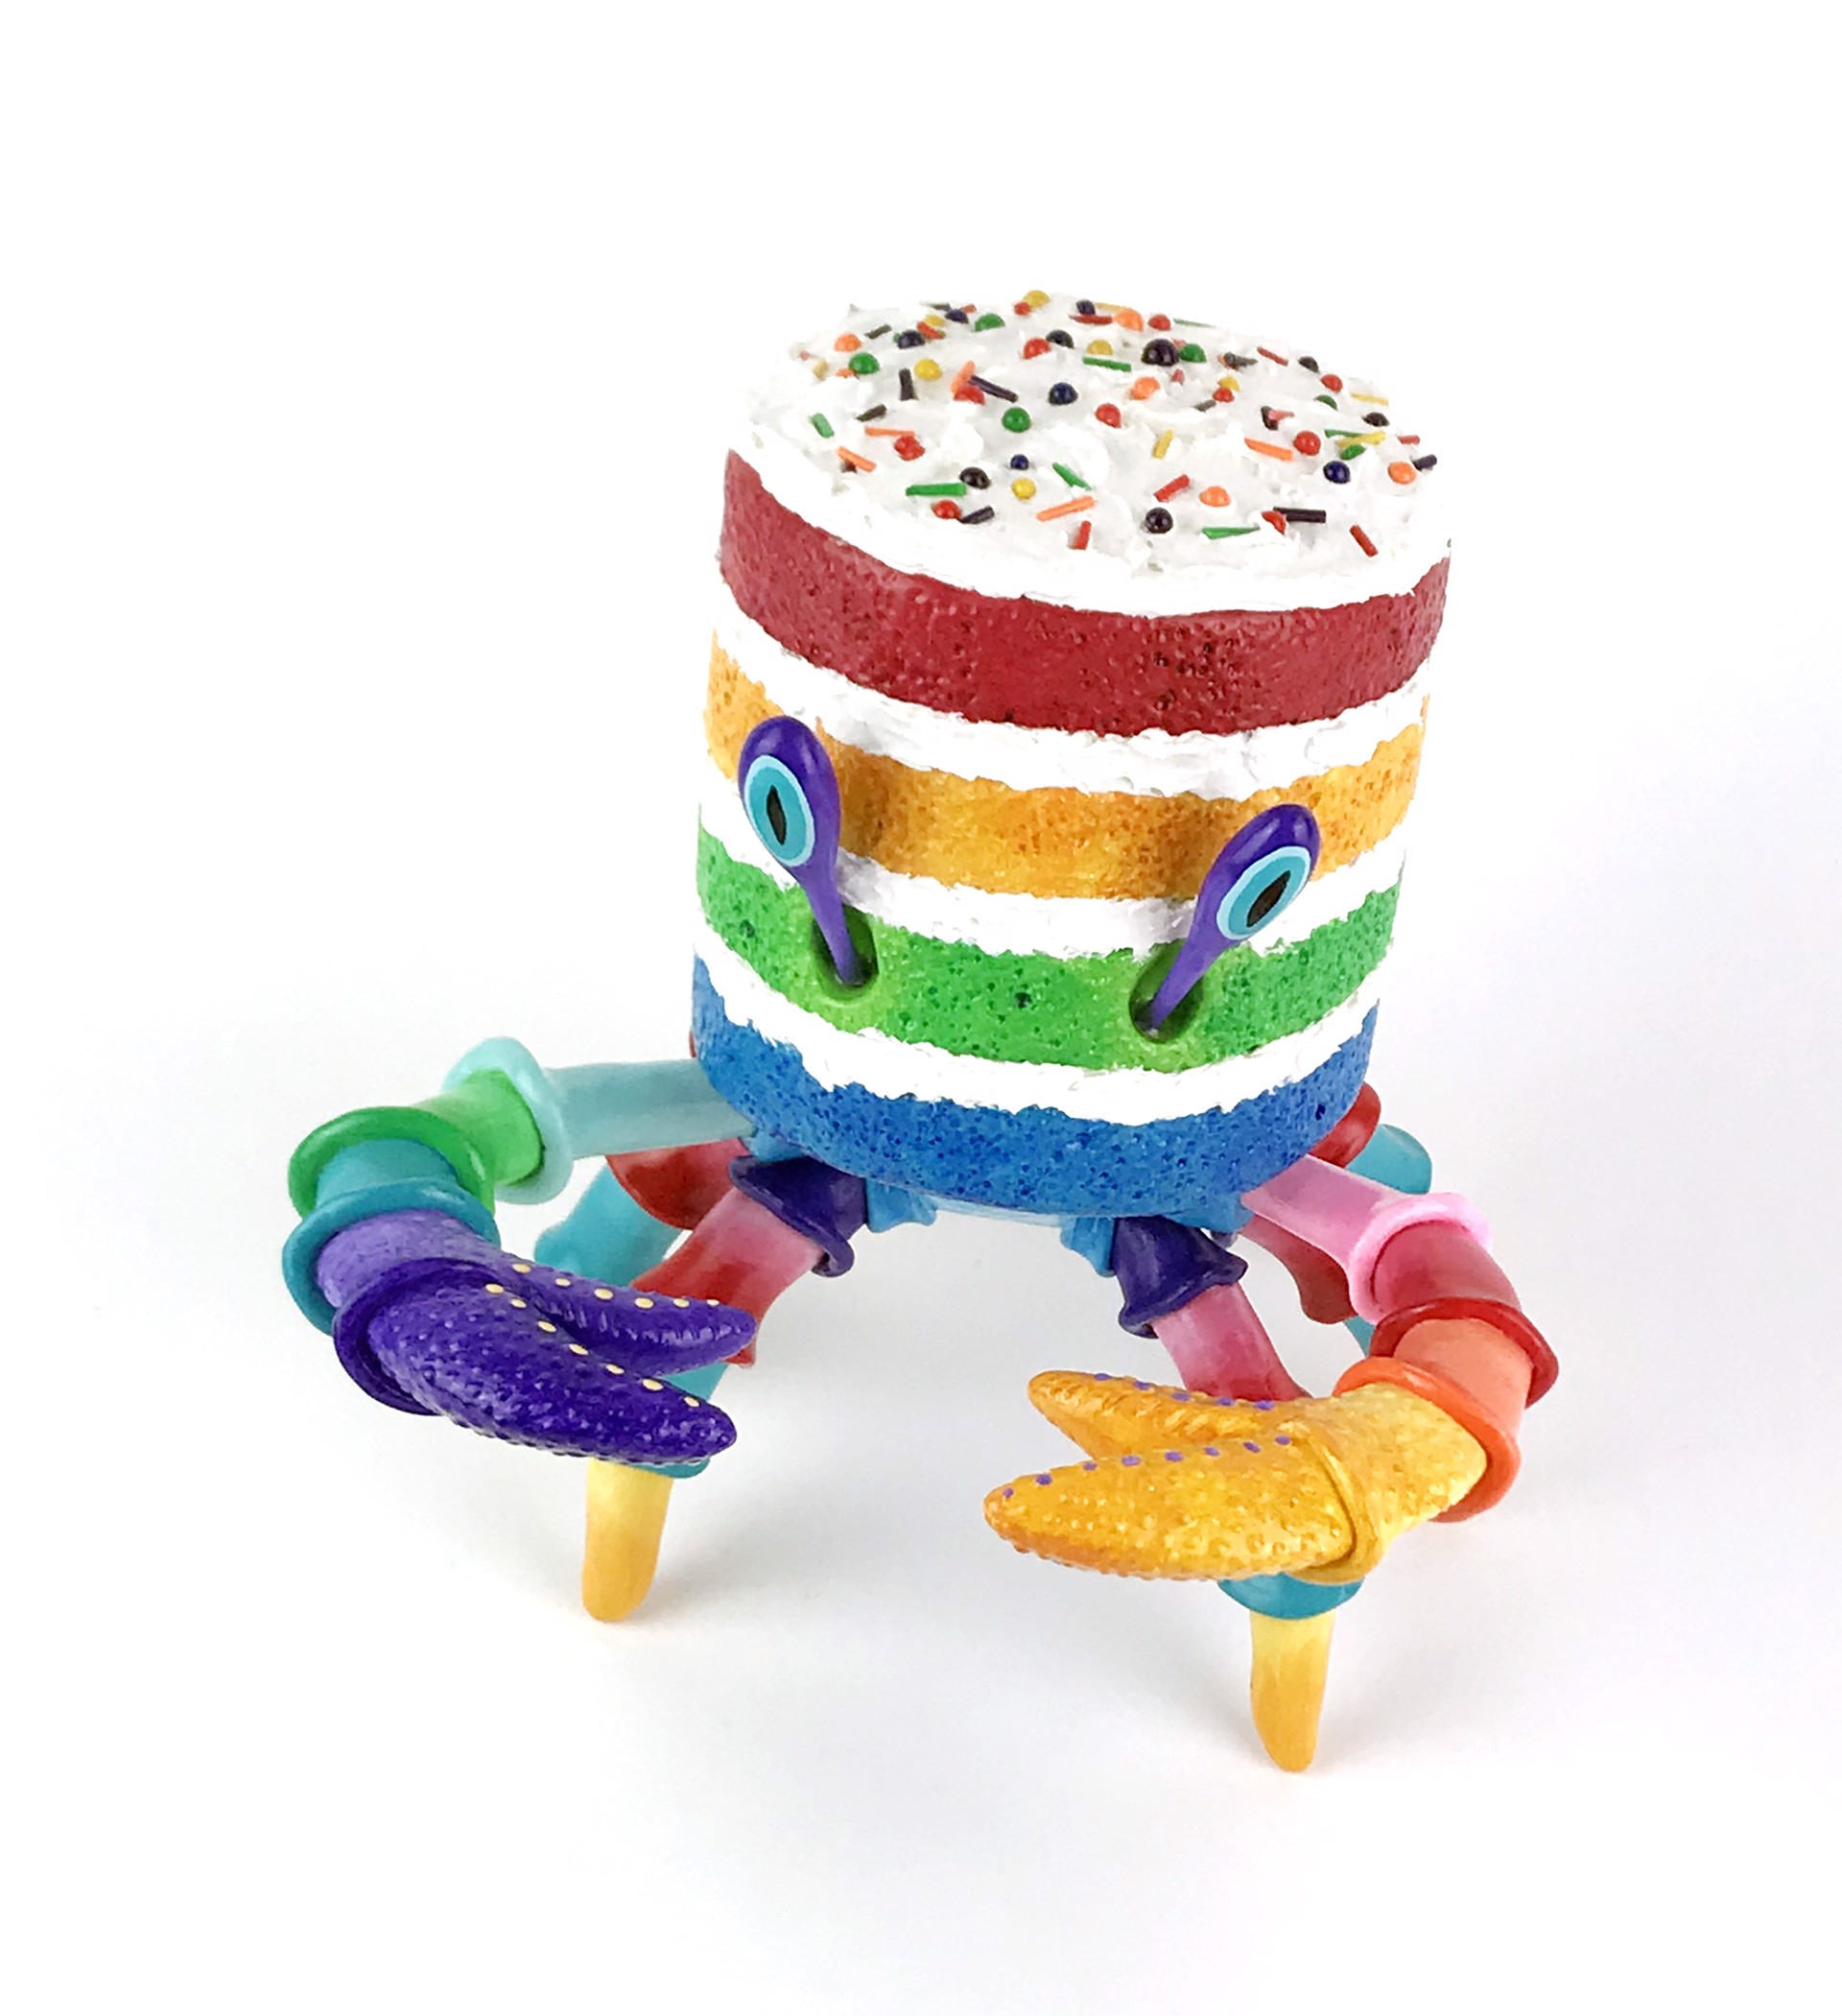 Lil' Rainbow Crabcake by Corina St. Martin